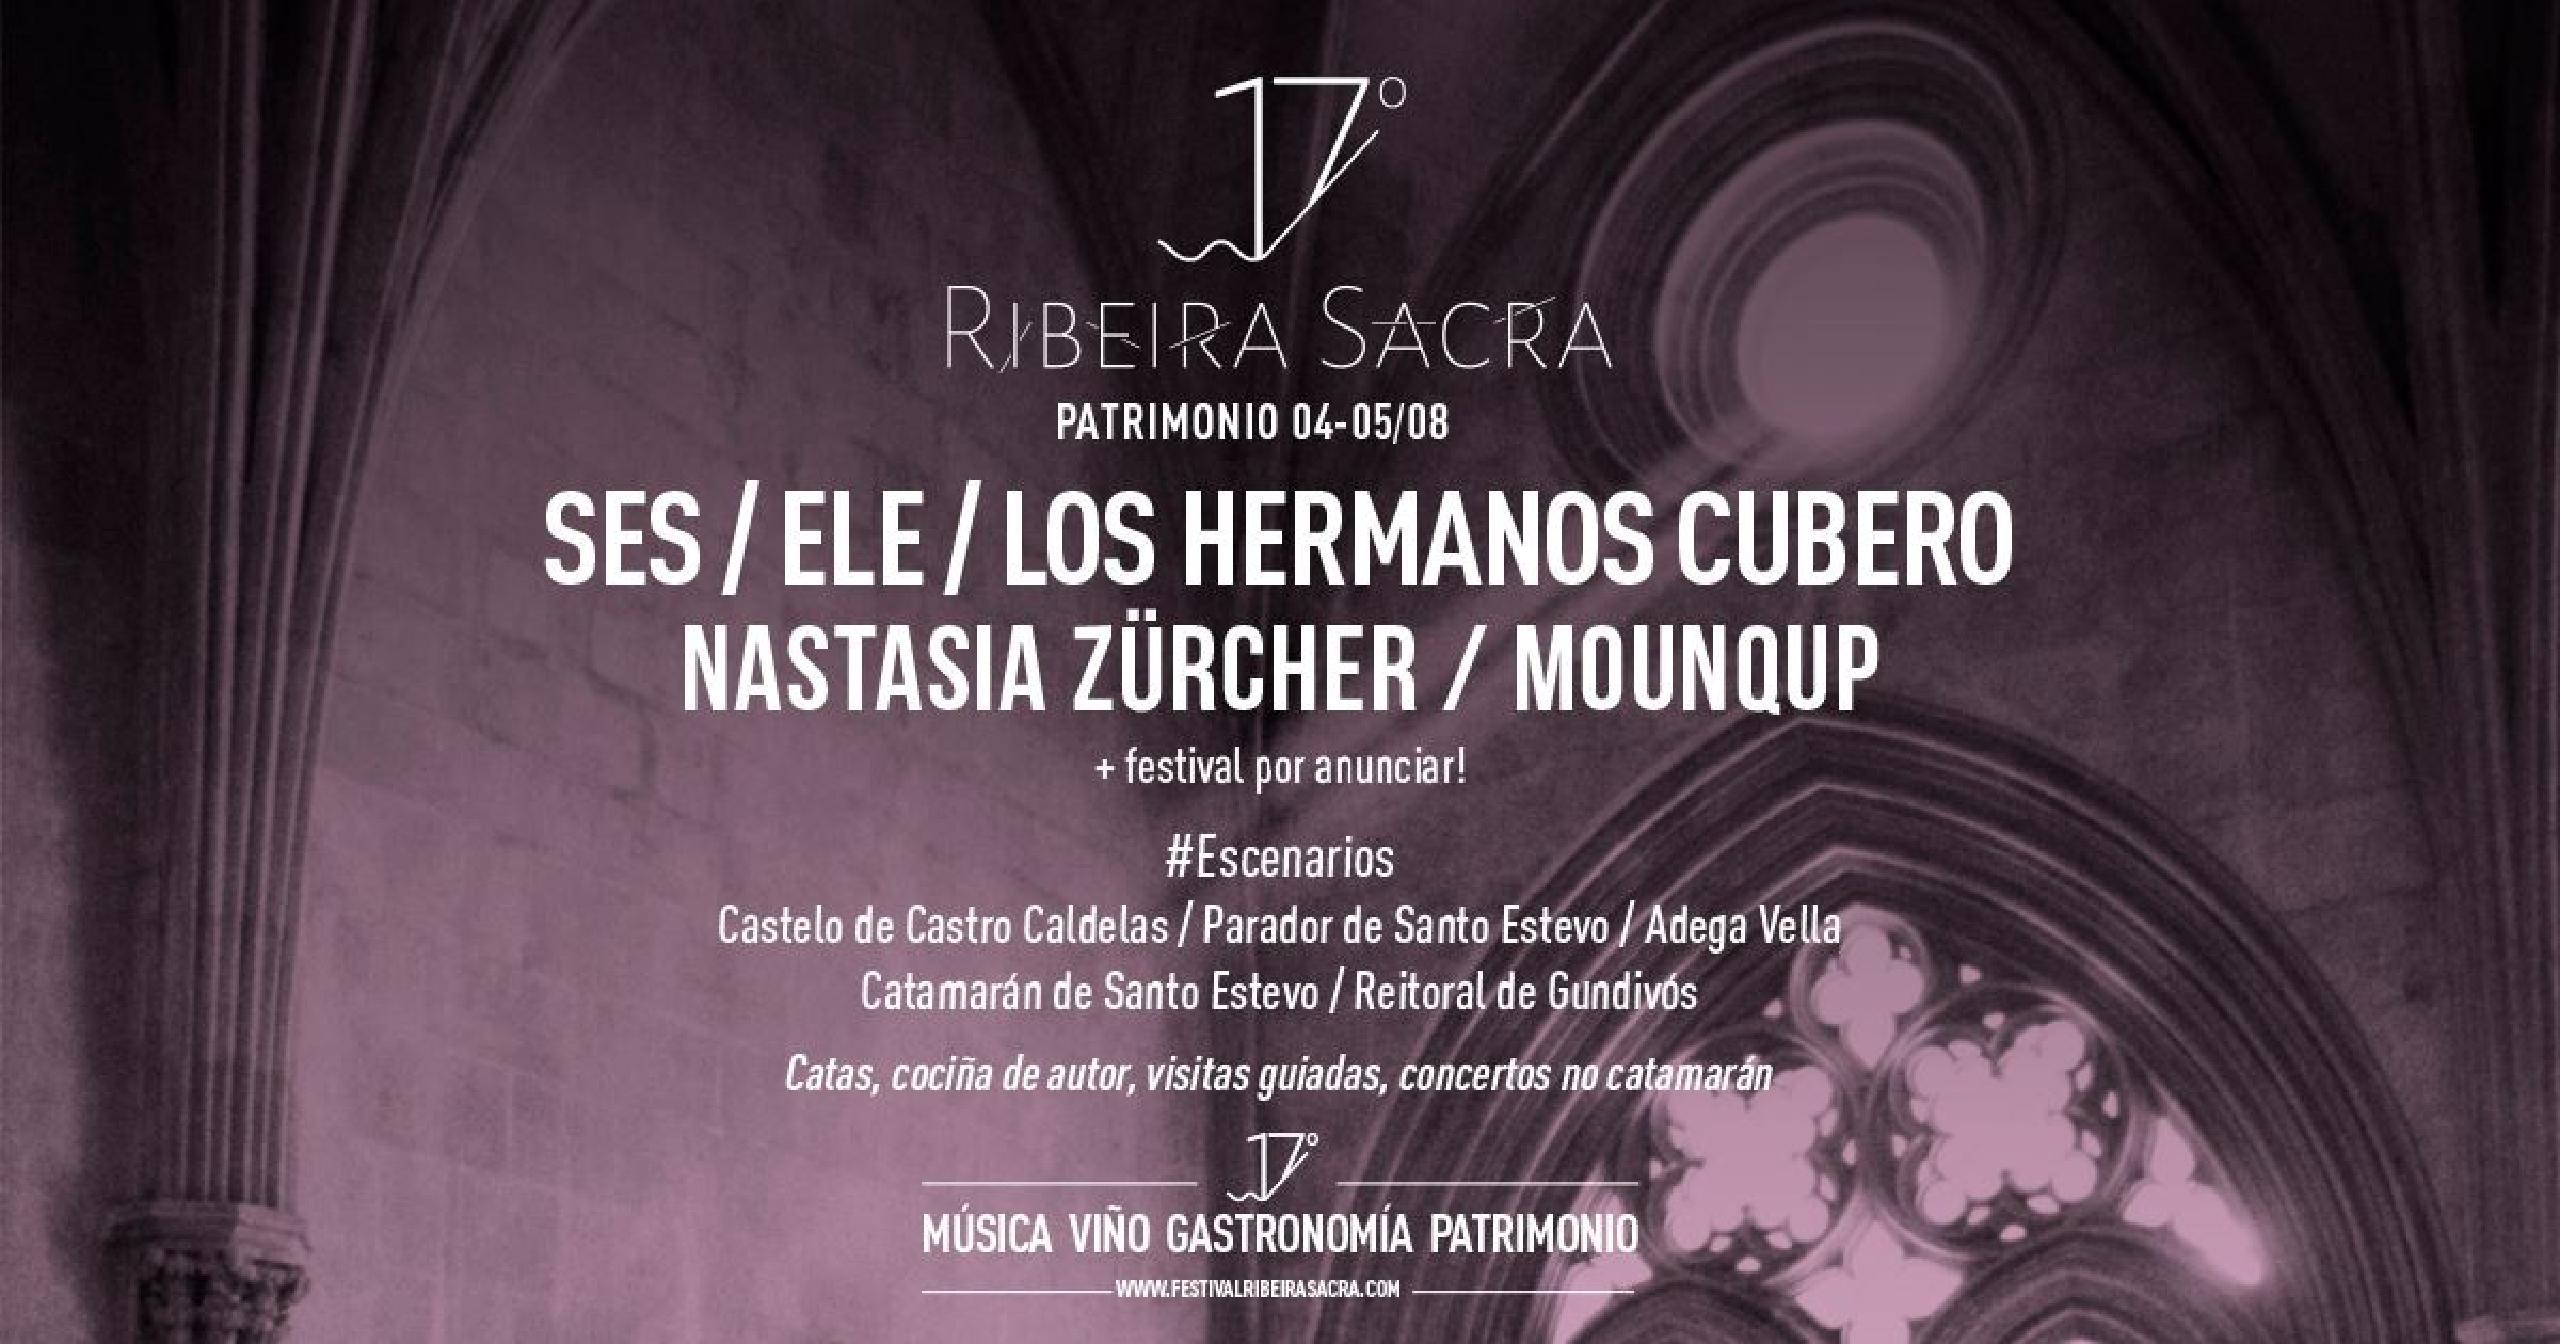 Ribeira Sacra 2018